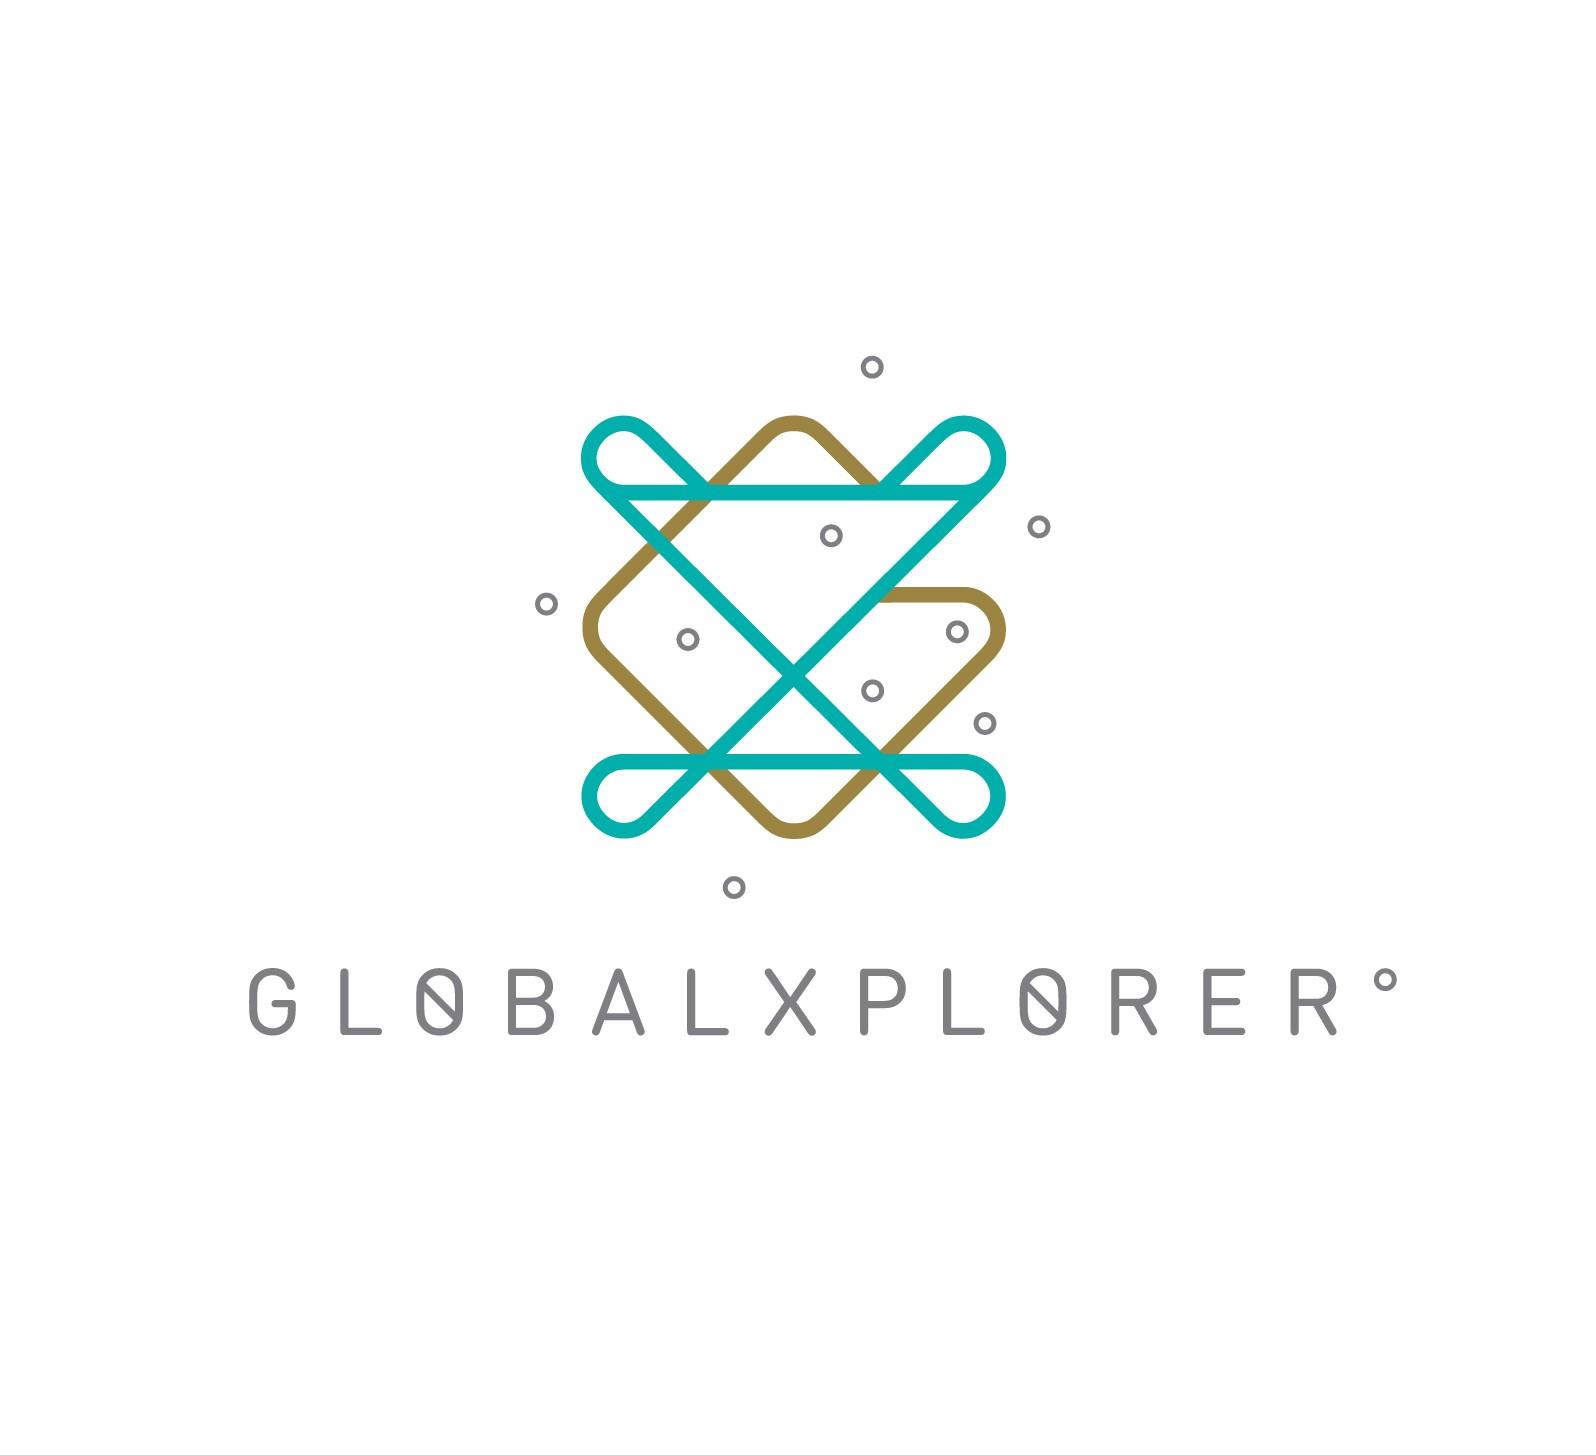 GlobalXplorer logo